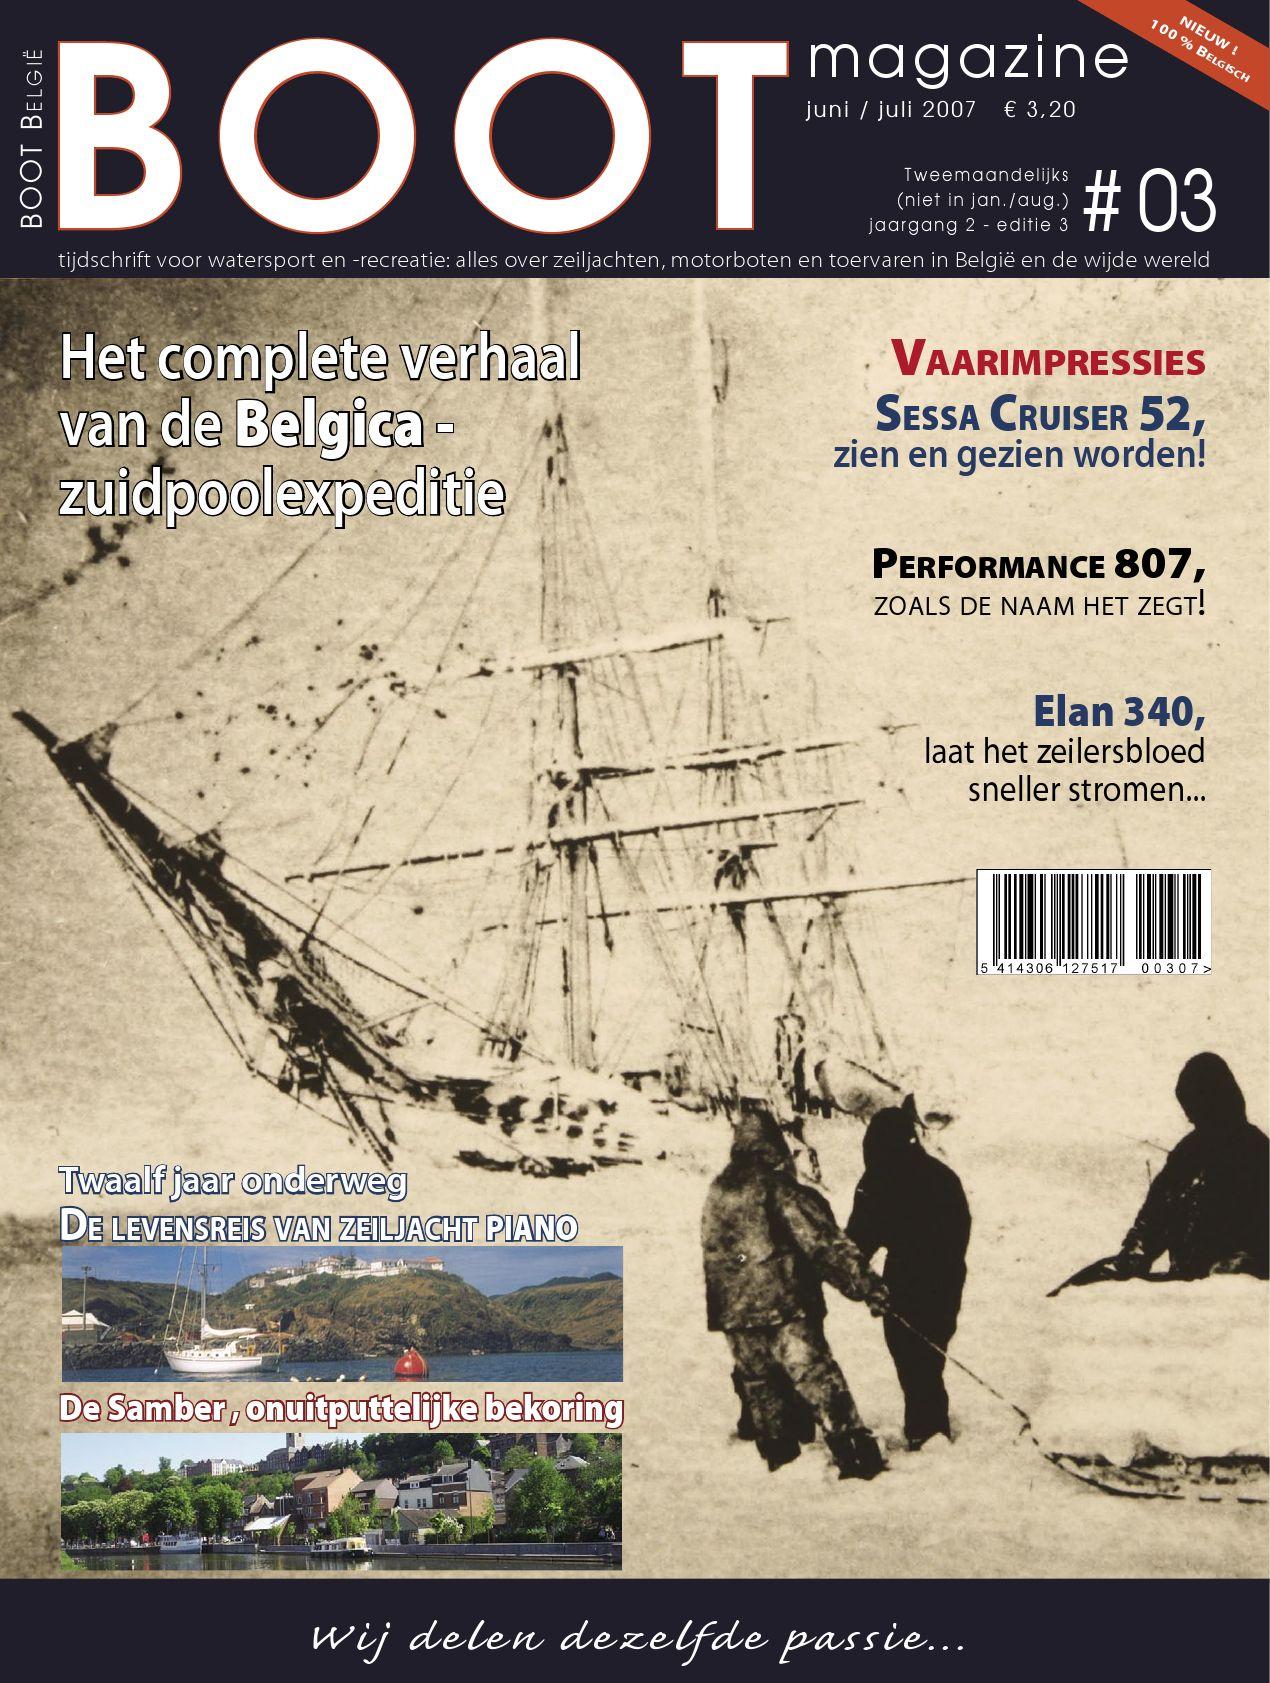 BOOTmagazine # 08 by Leo Van Dorsselaer - issuu